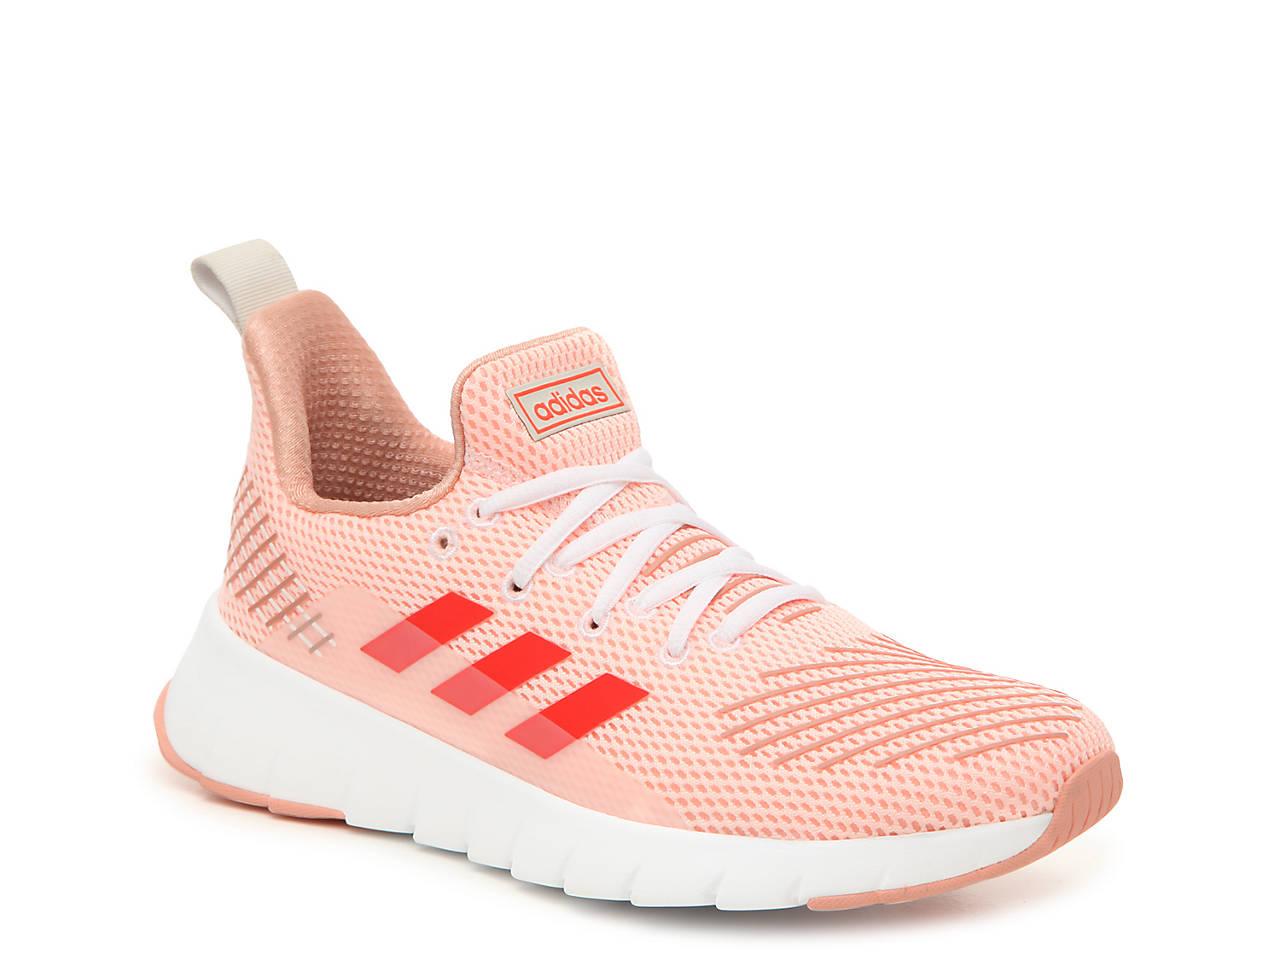 60854fa45f Asweego Running Shoe - Women's